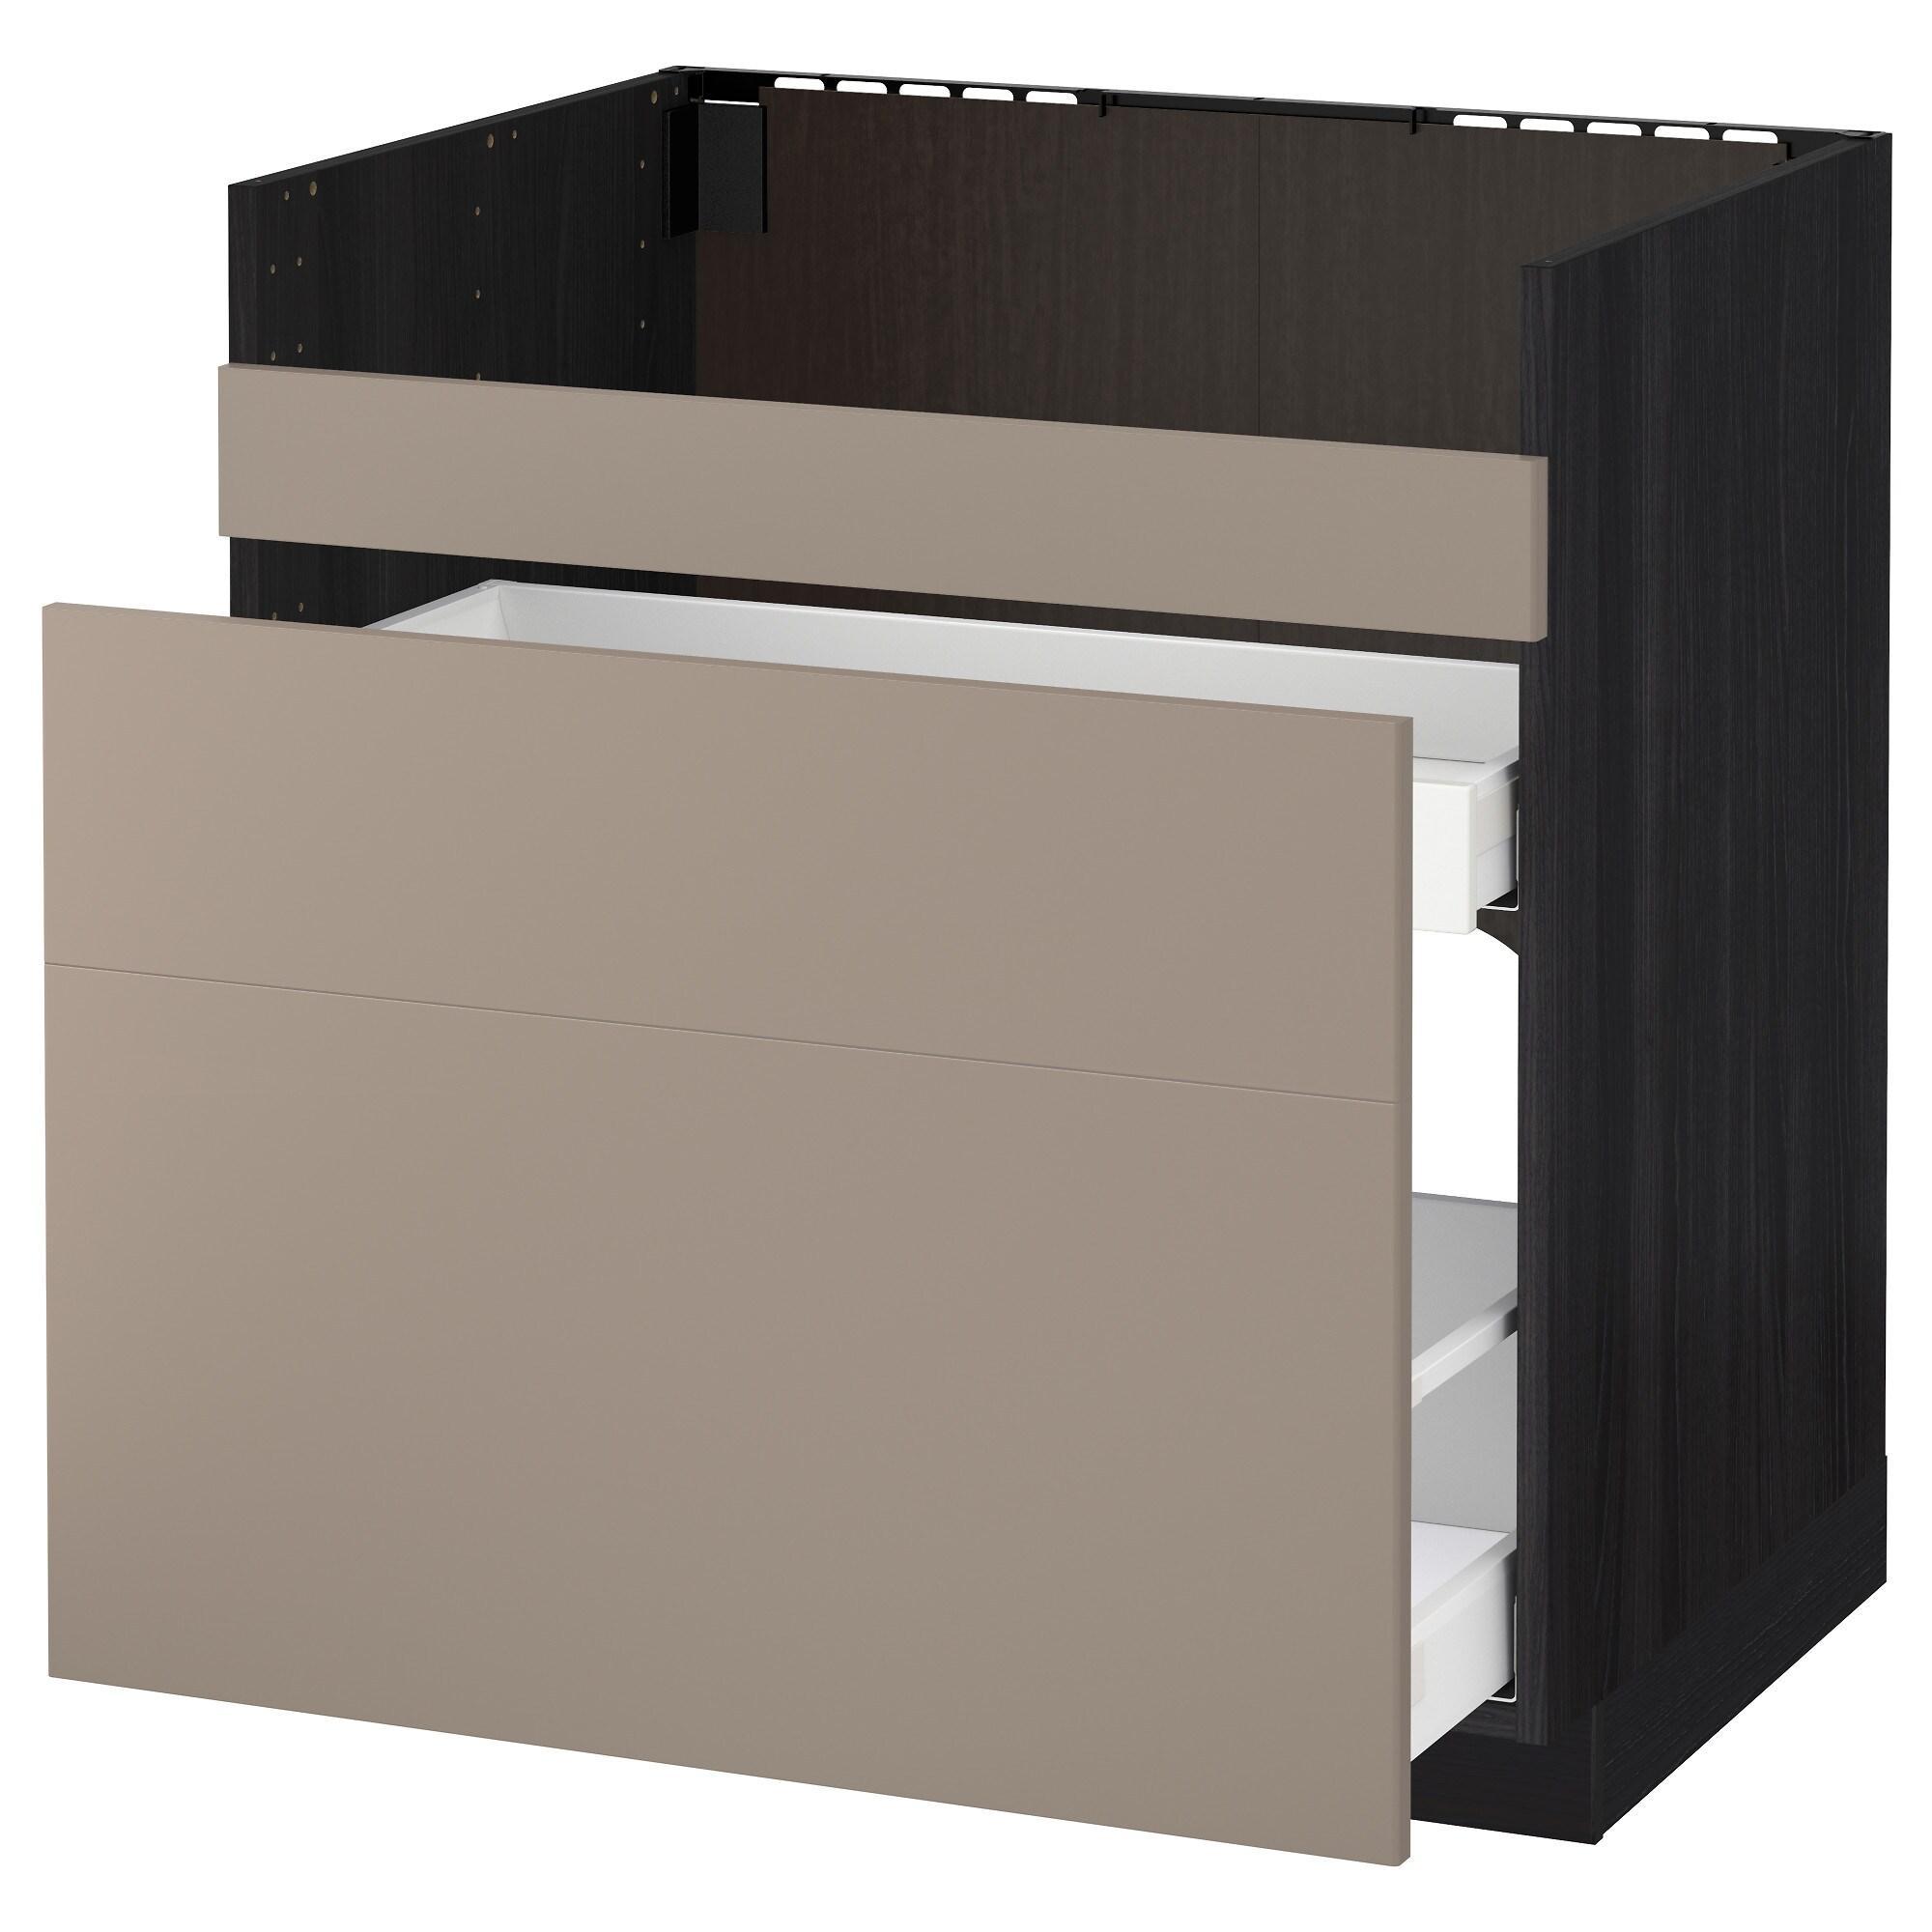 Ikea Havsen Spüle Einbauen